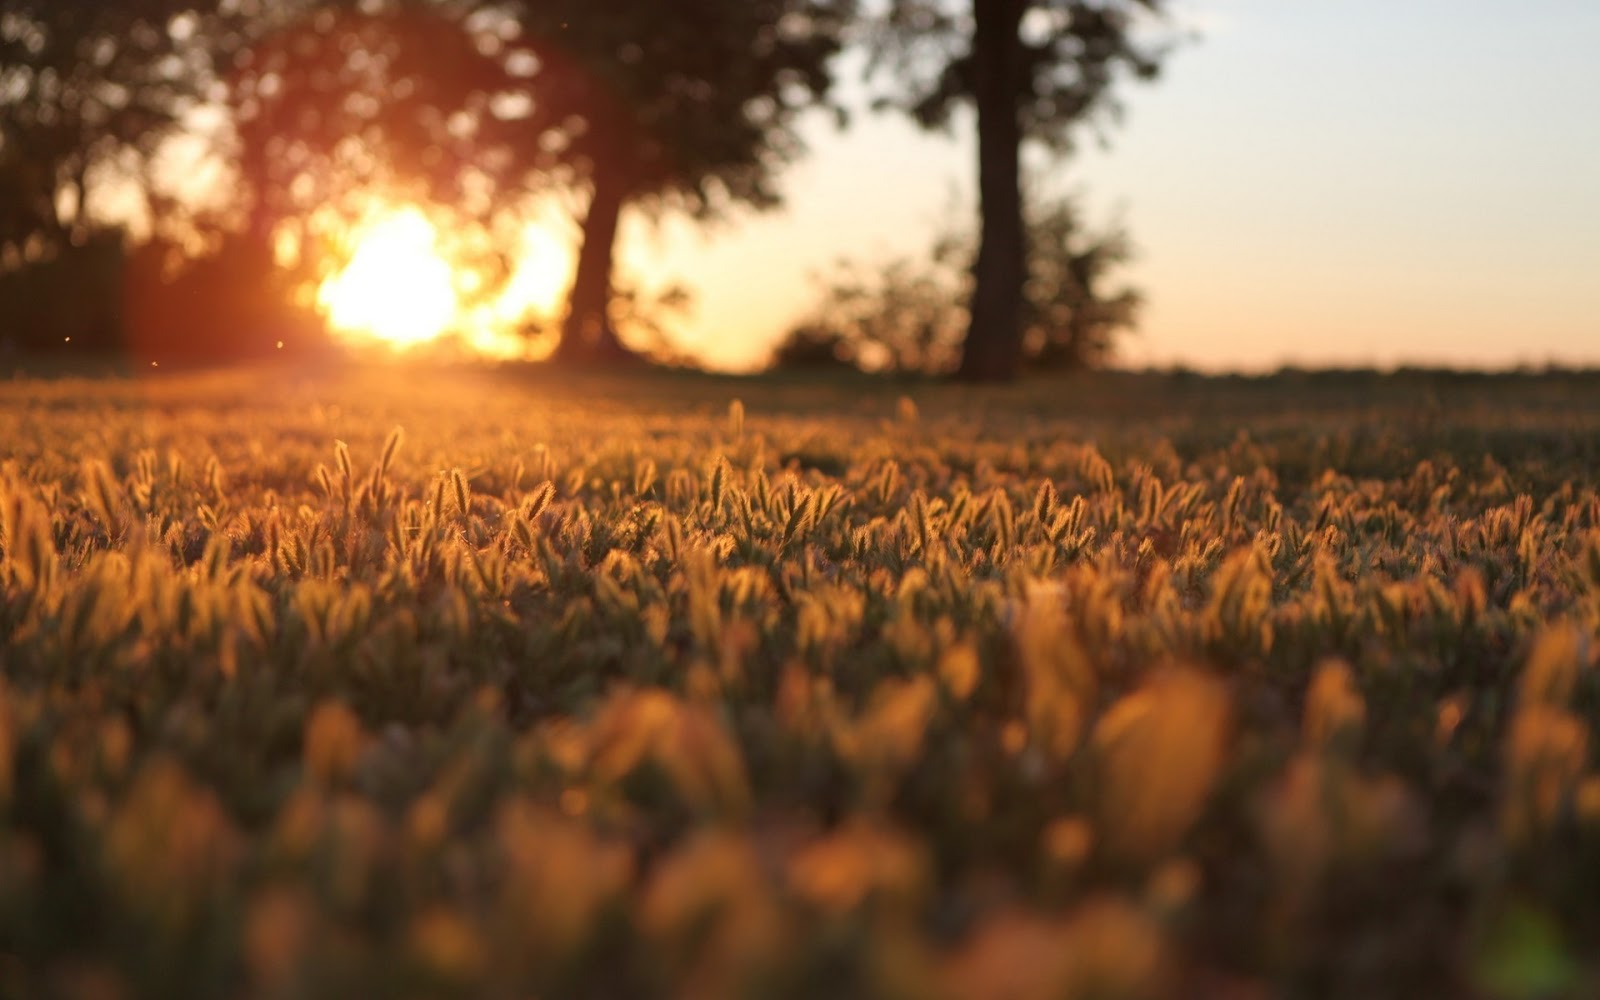 http://2.bp.blogspot.com/-LyN8MZDUxSk/T5K-LRg6eYI/AAAAAAAAAOg/Nk2UZkEBj3k/s1600/warm+sunset+wallpaper.jpg